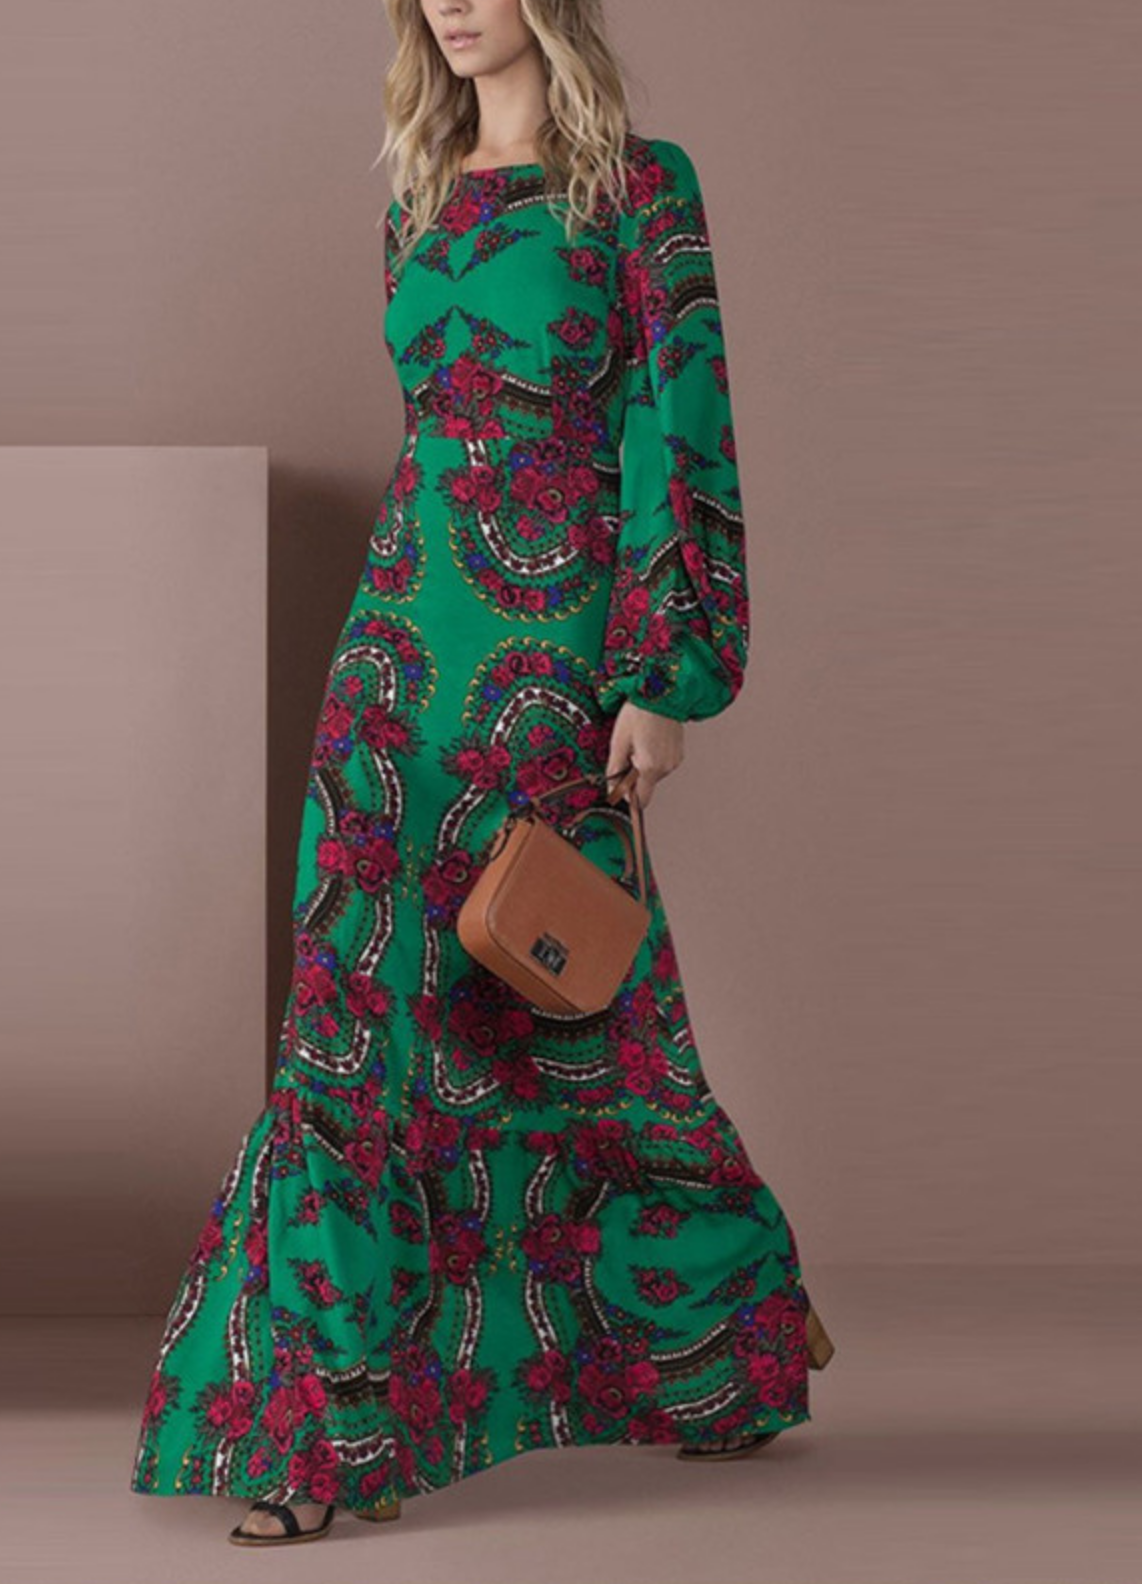 Robe longue fond vert imprimée boho boheme chic DRESSL1776